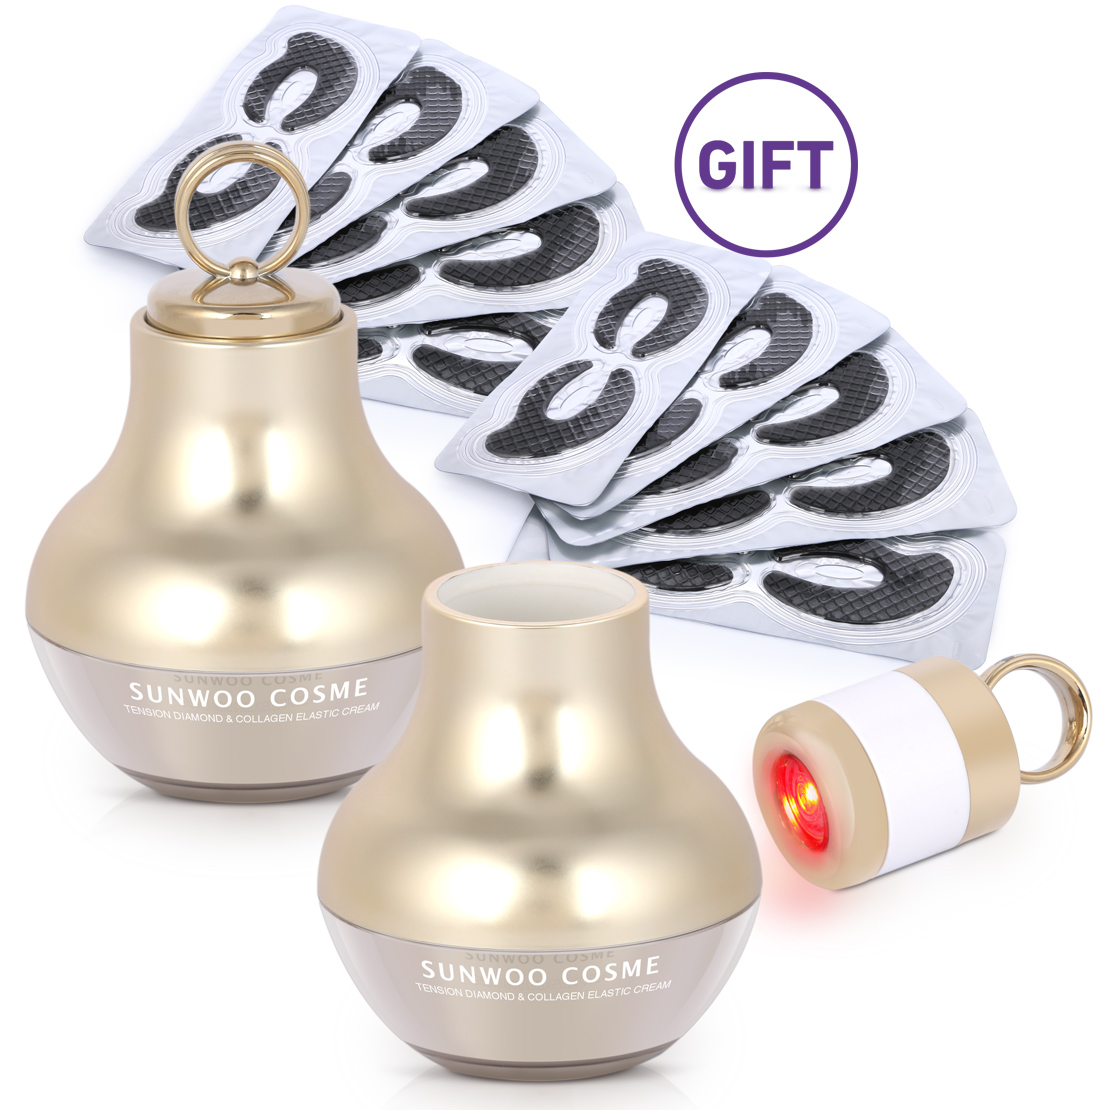 Diamond & Collagen LED Cream & Gifts